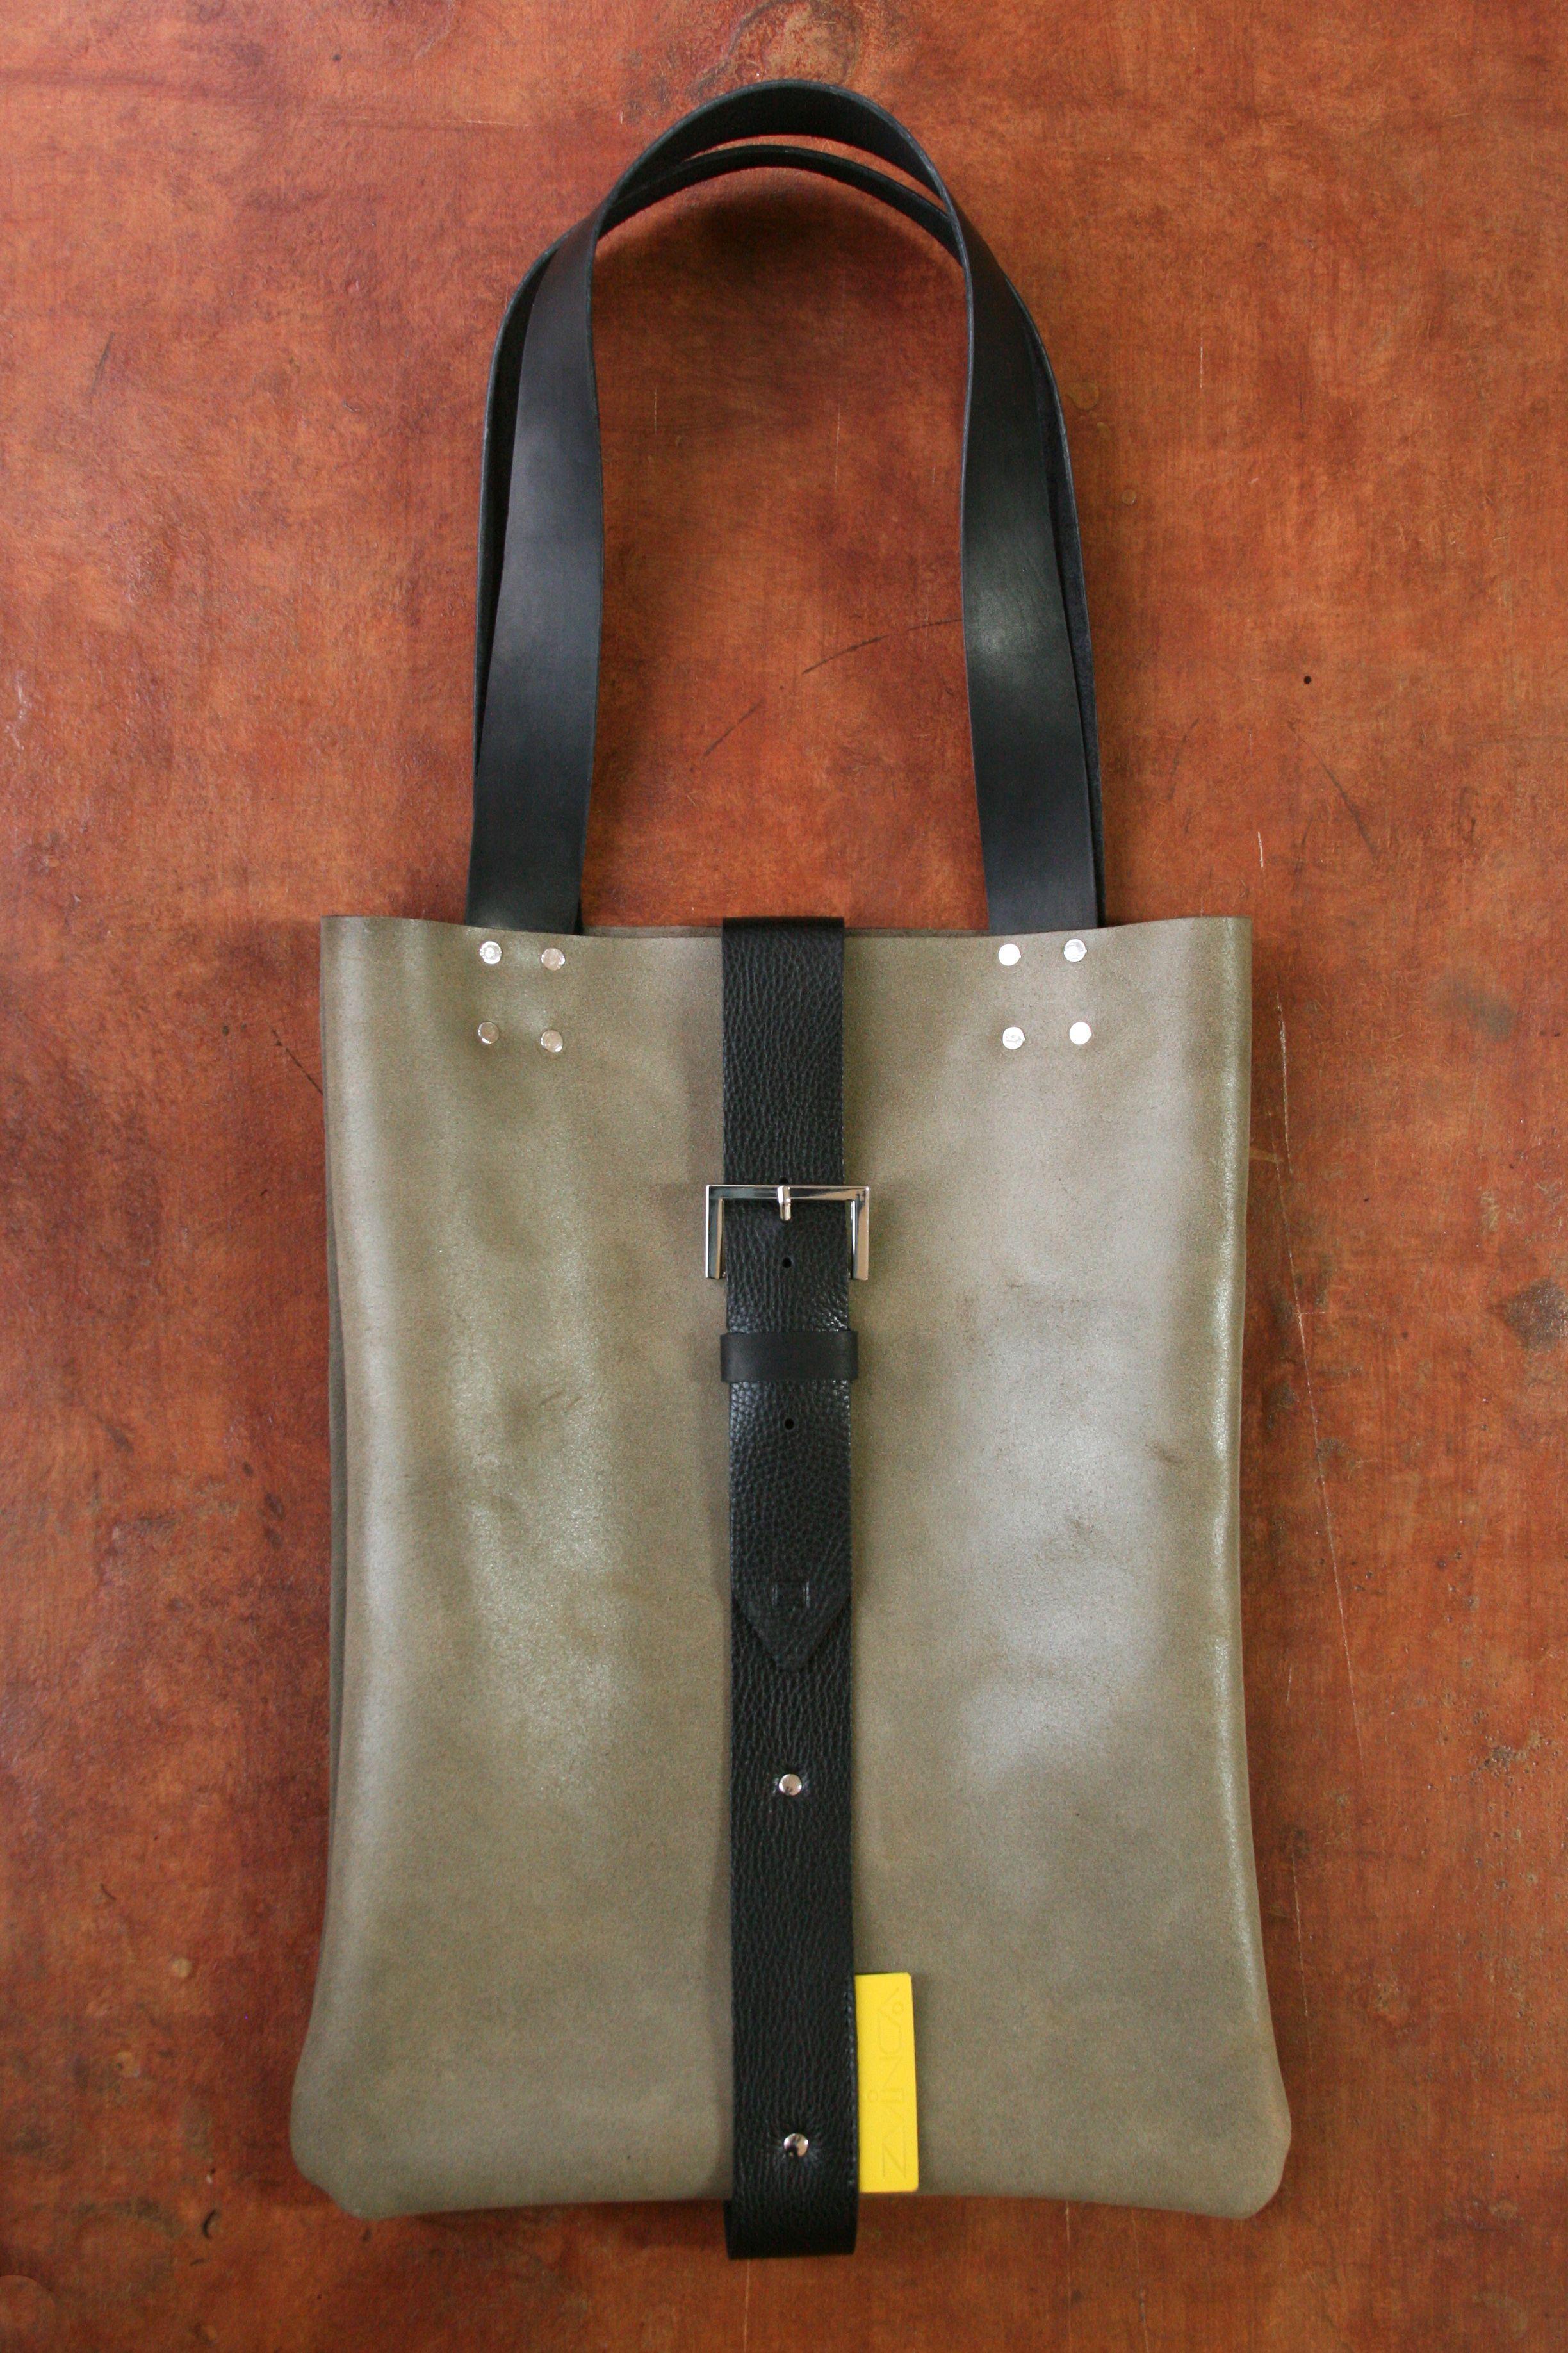 ZVINCA Leather Tote www.zvinca.ro https://www.facebook.com/zvinca.design